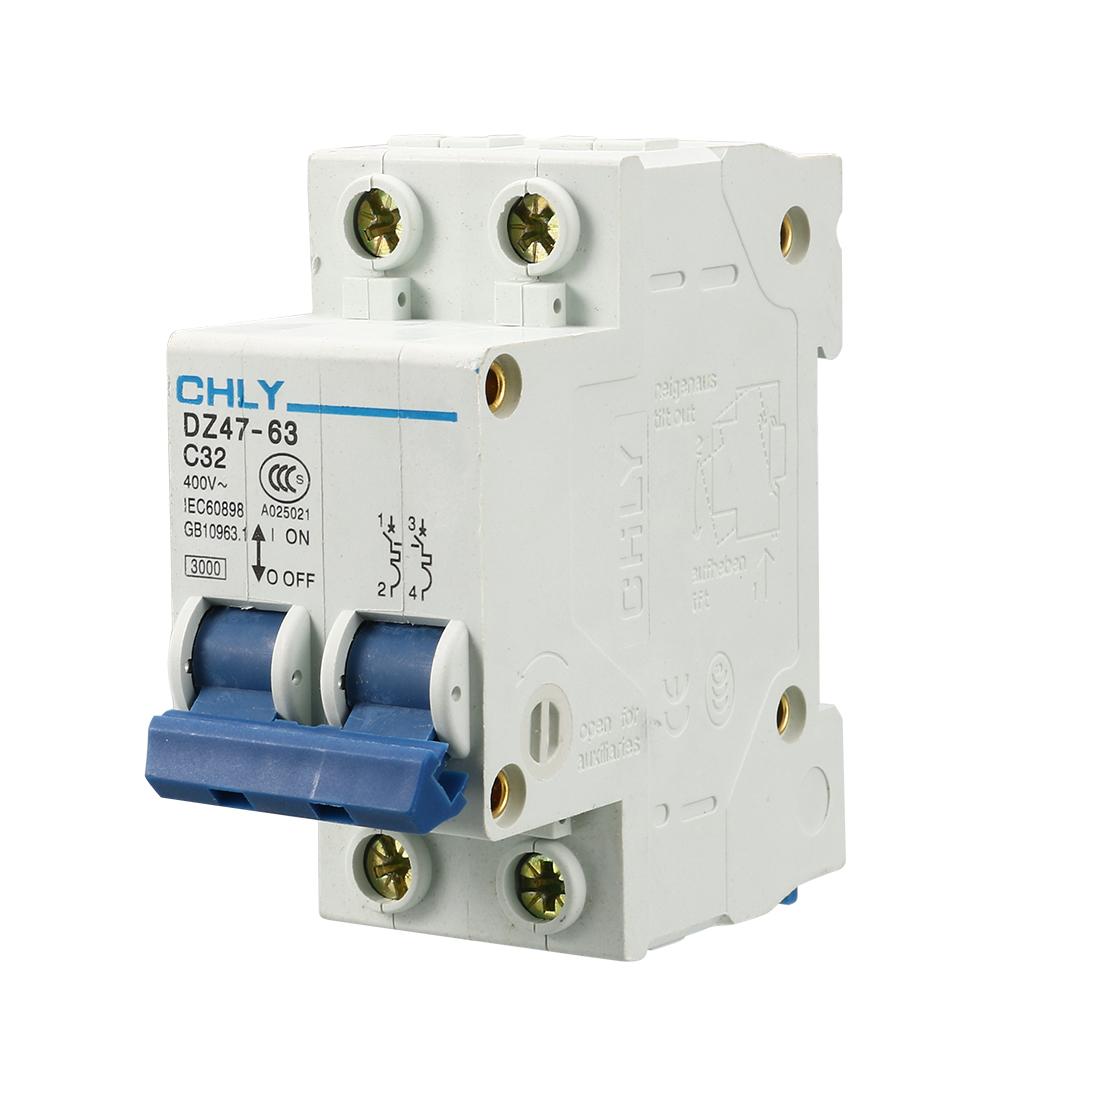 DZ47-63 C32 2P 32A Circuit Breaker